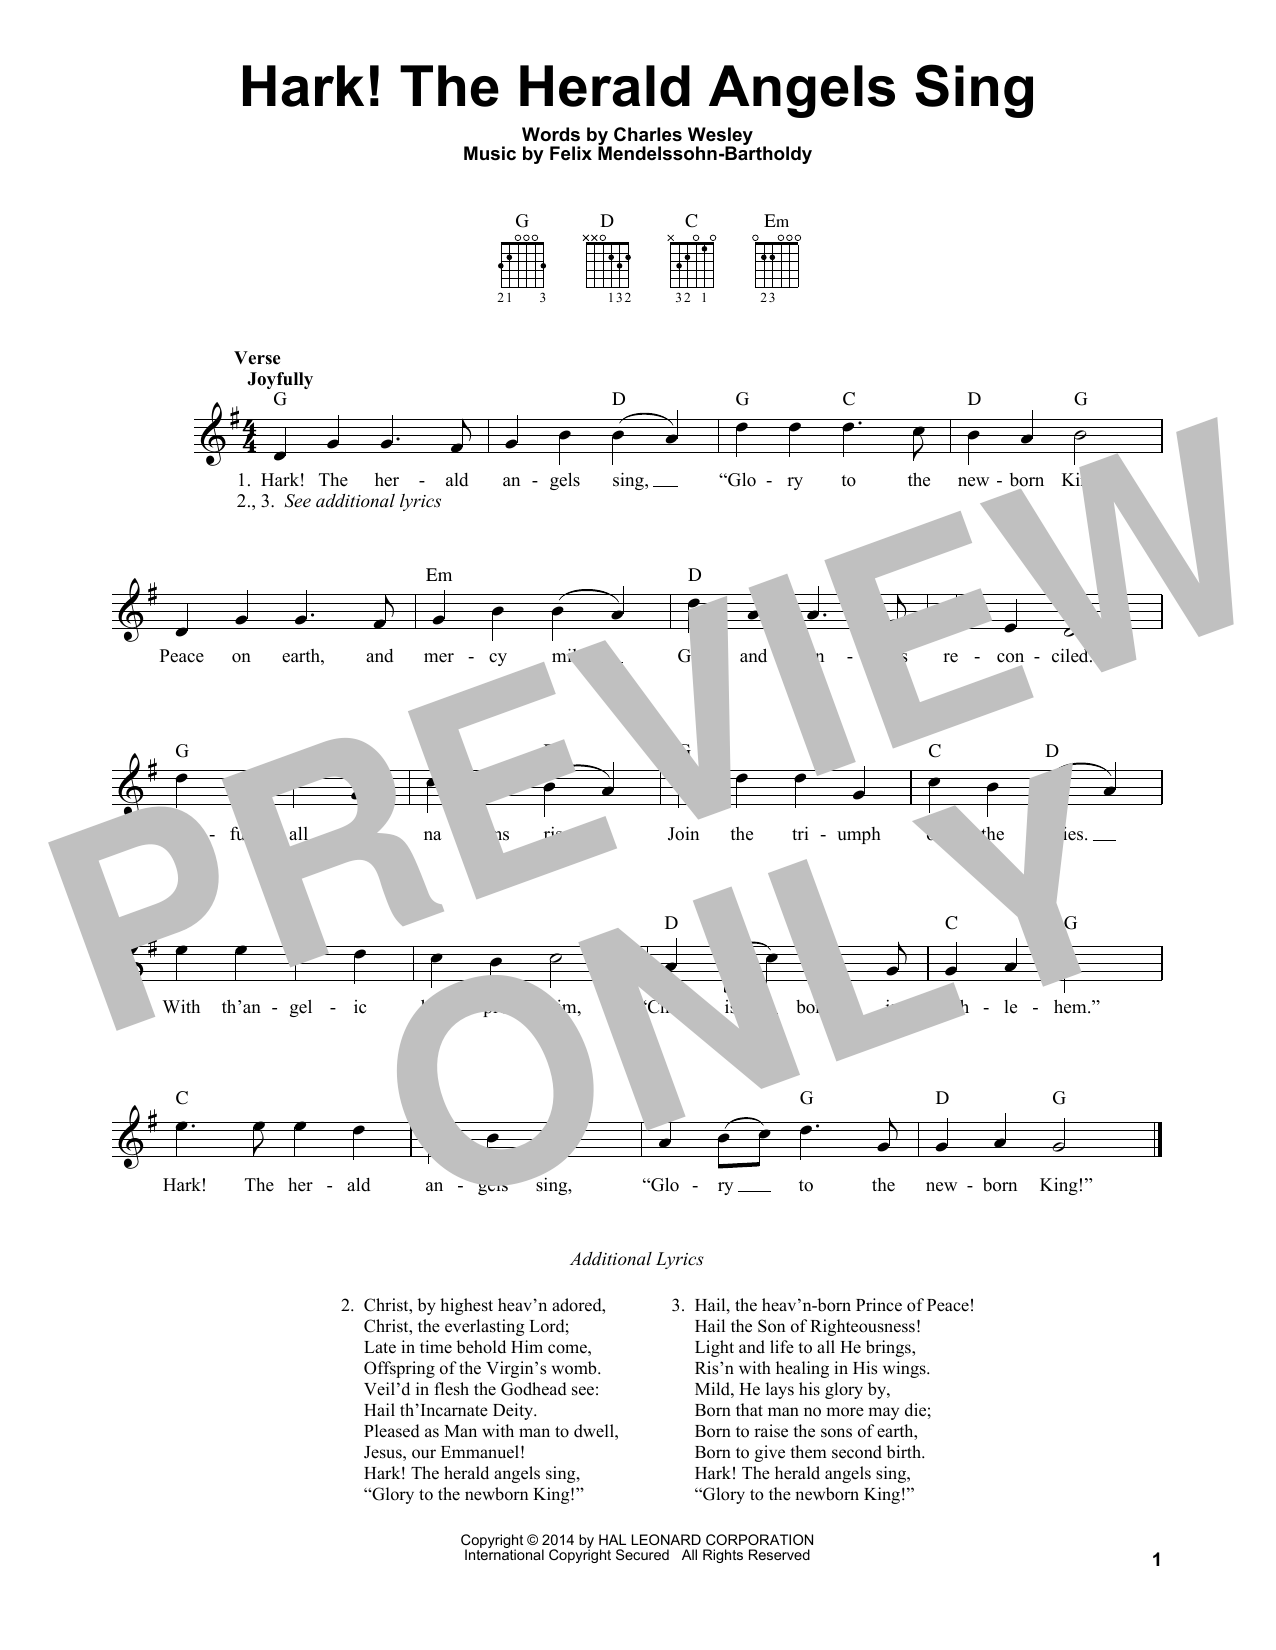 Charles Wesley - Hark! The Herald Angels Sing